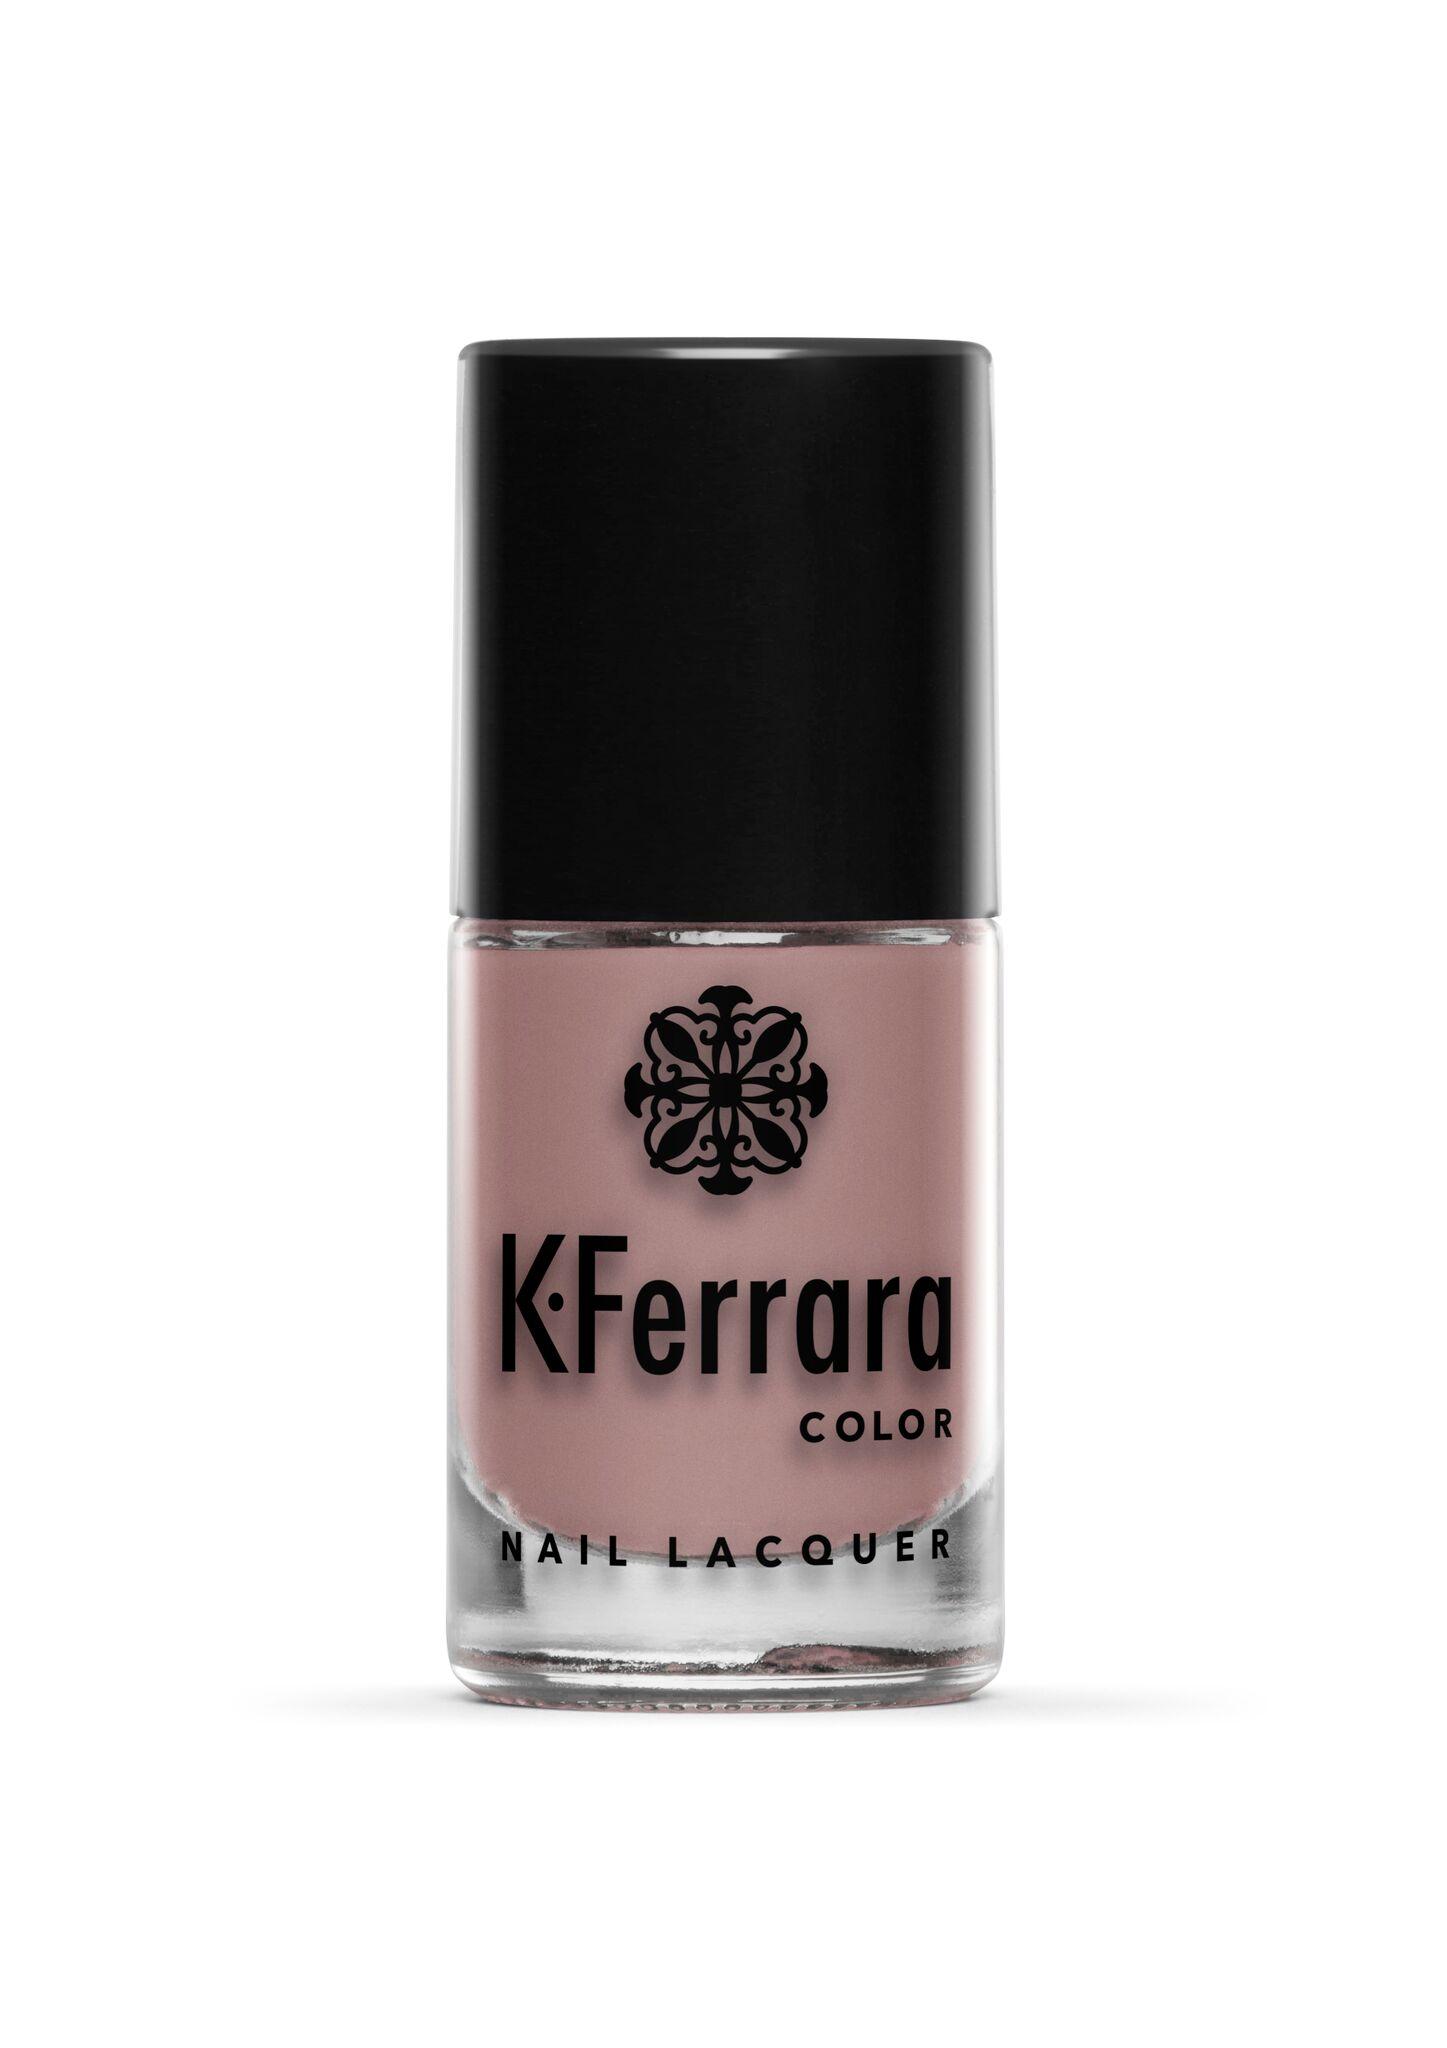 3e522a9dca51-KFerrara_Bottle_Francesca.jpg